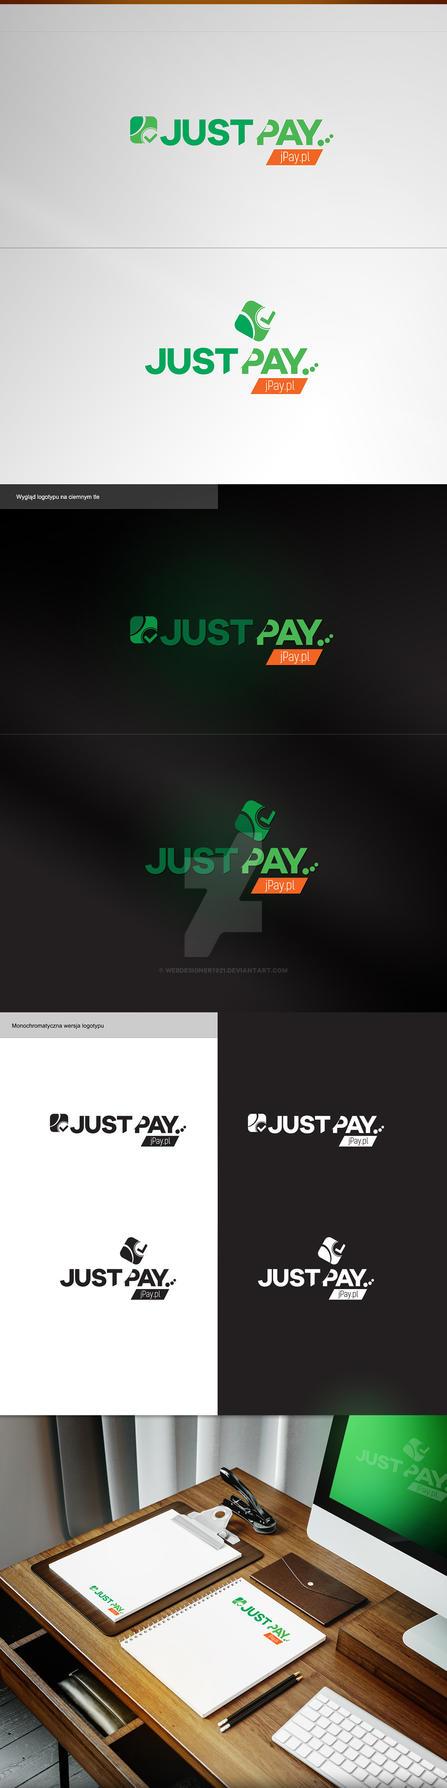 justpay - logo by webdesigner1921